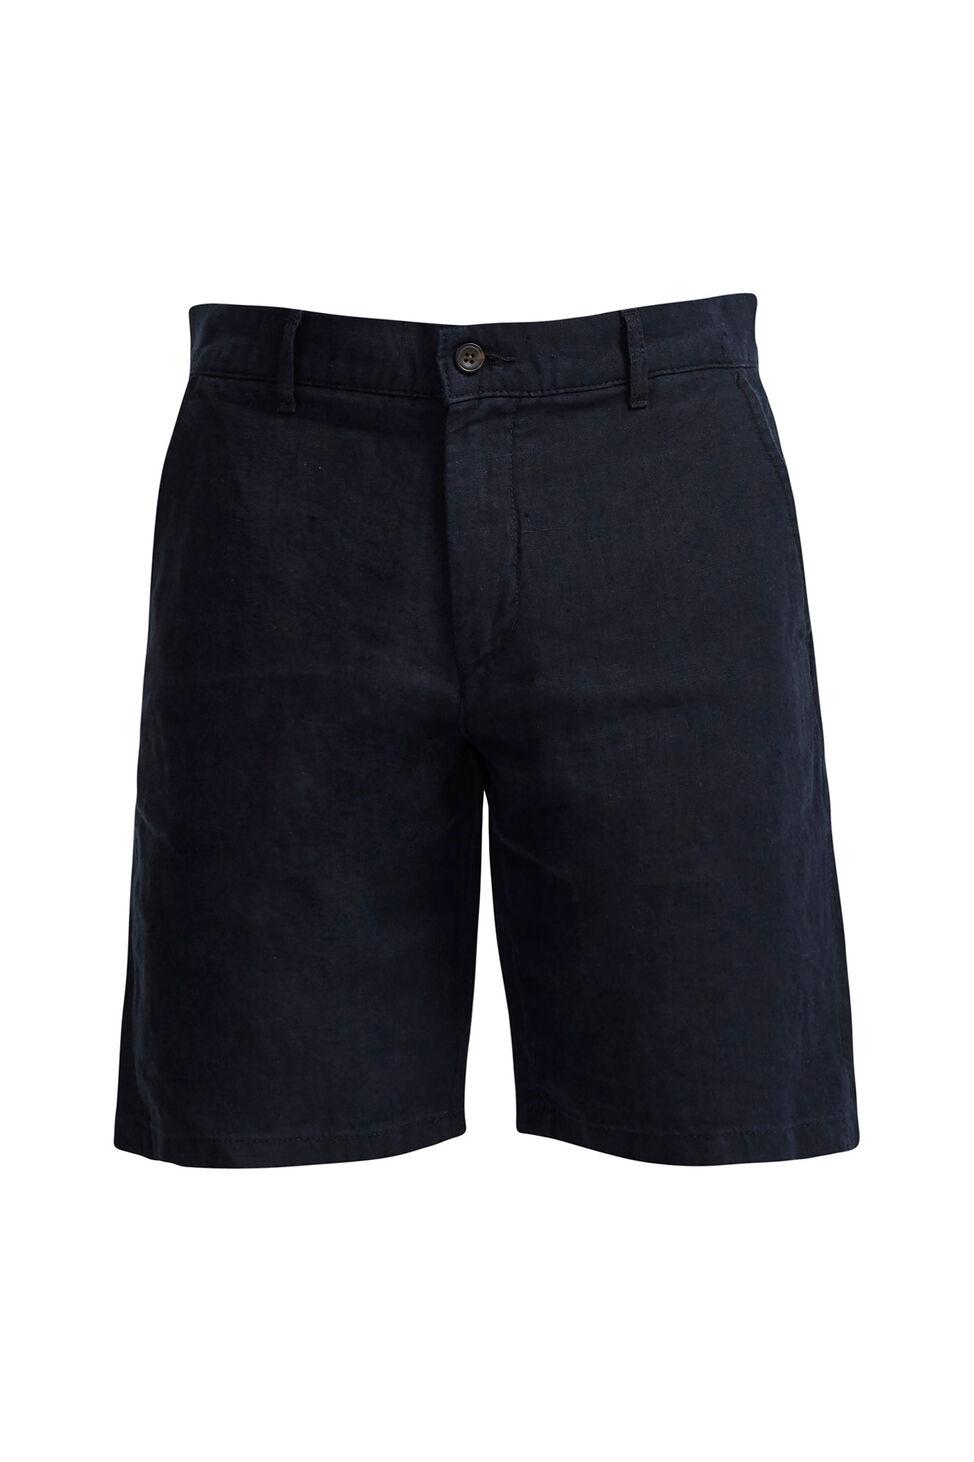 Crown shorts 1196 1941196205, NAVY BLUE